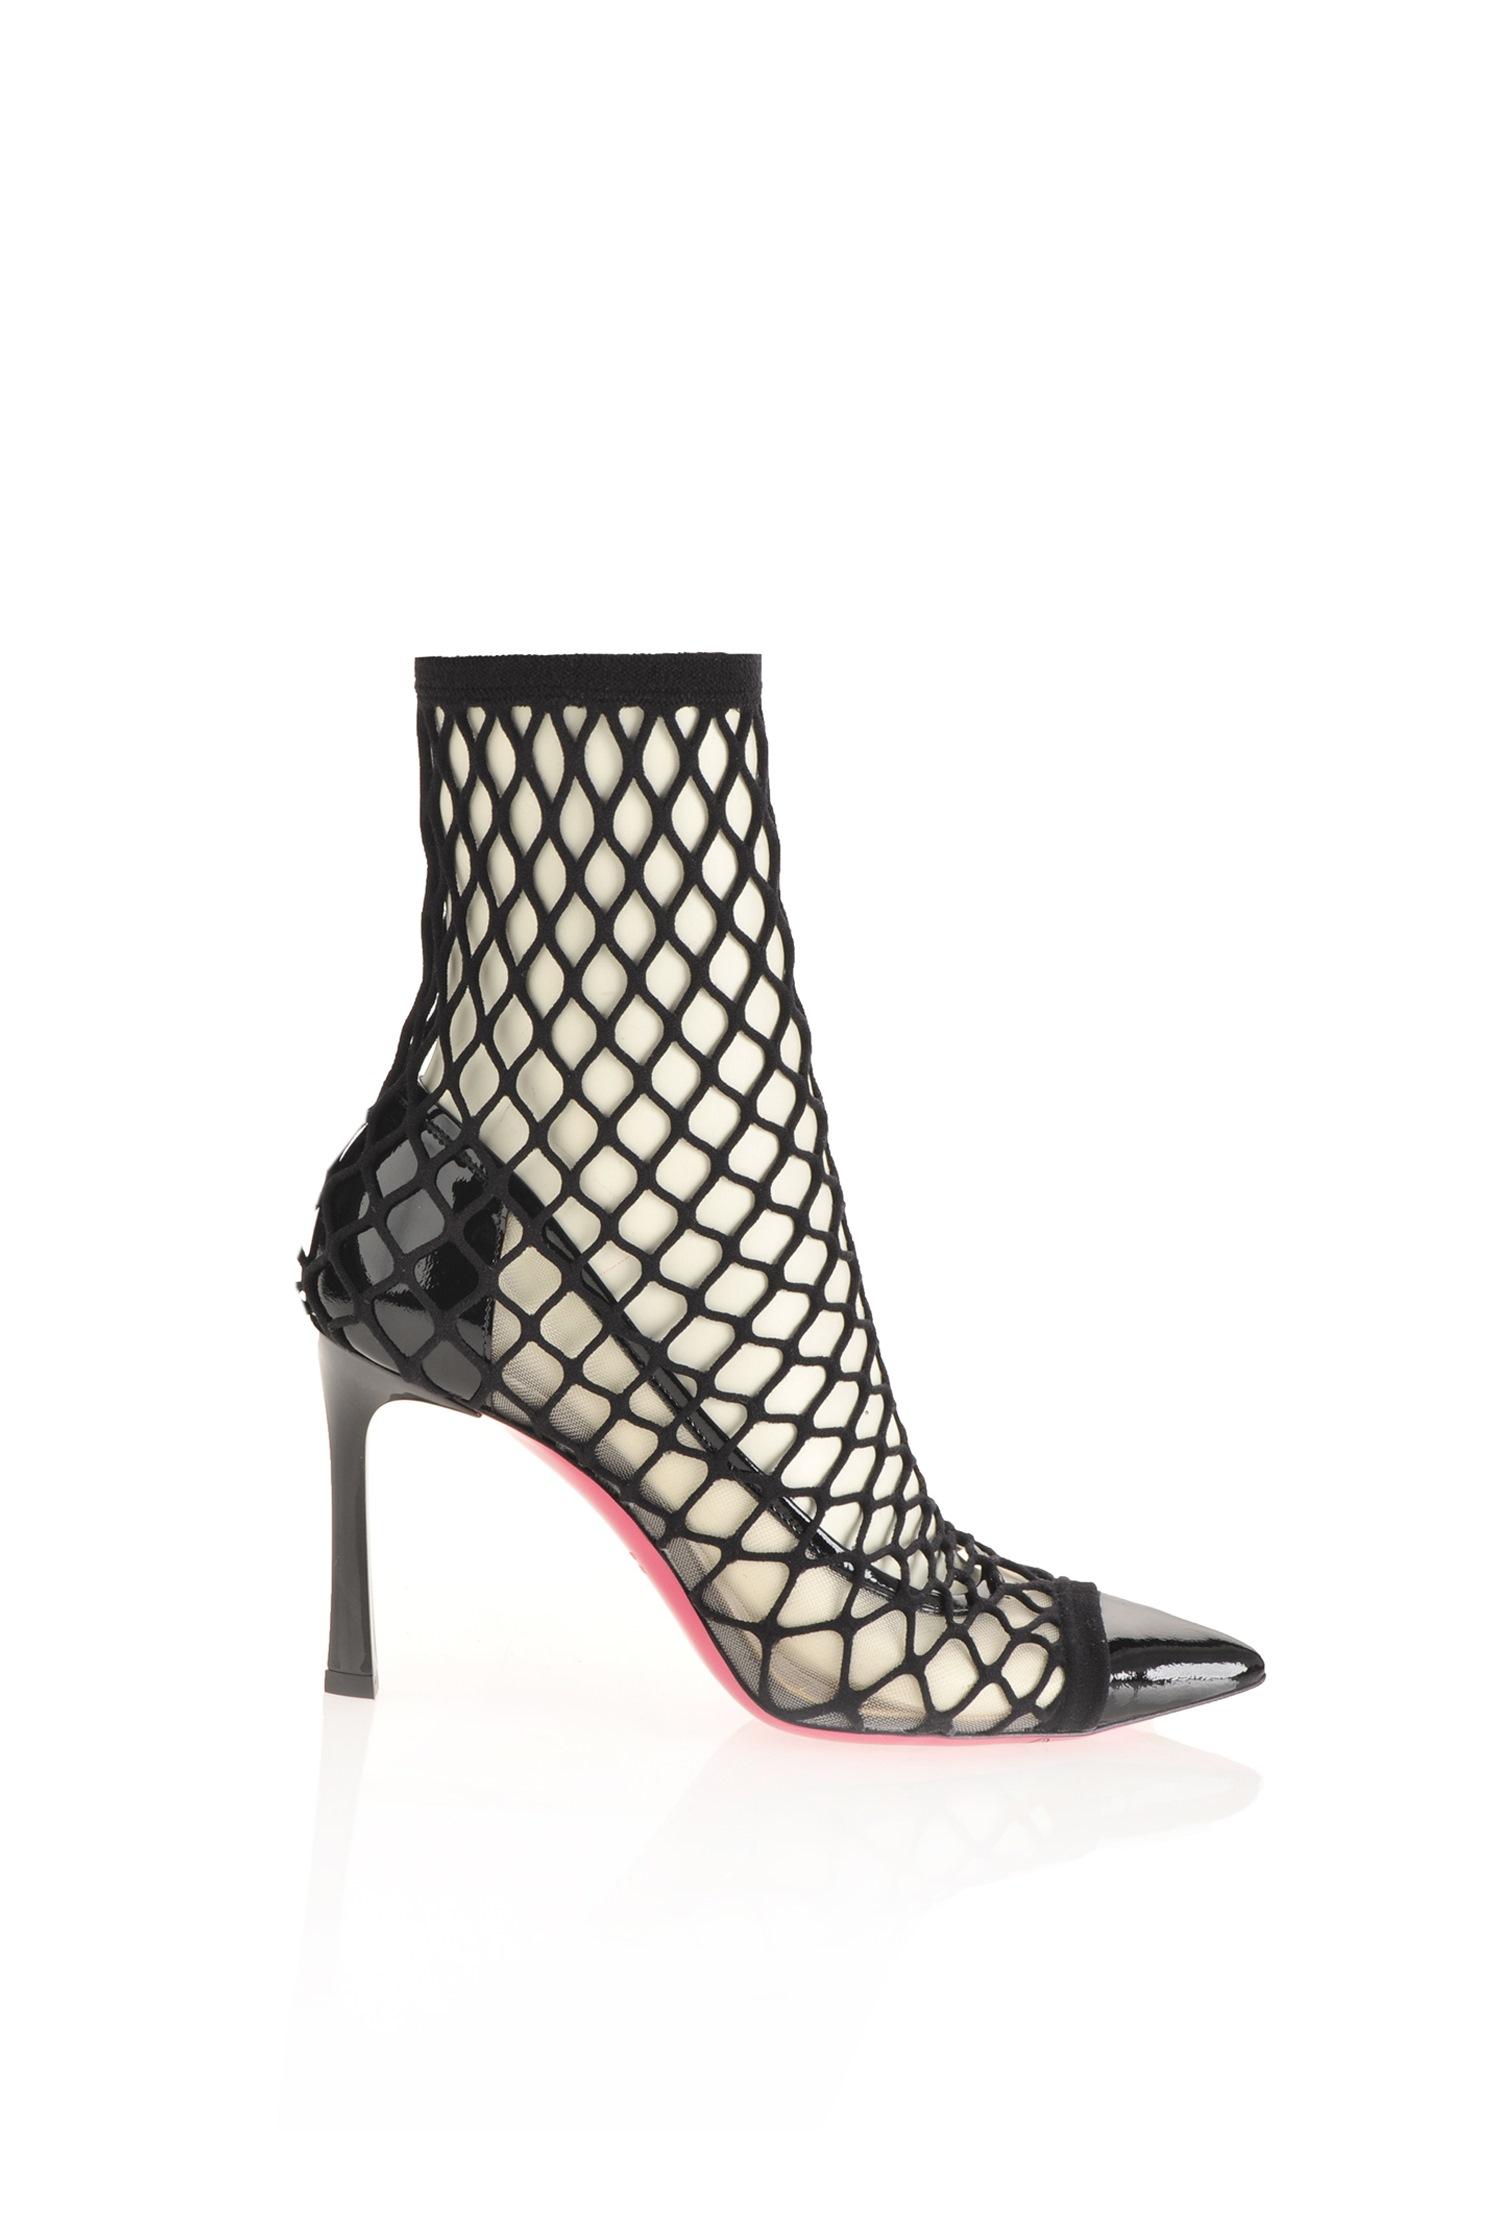 311b844c60e Patent leather pumps with fishnet socks - PINKO